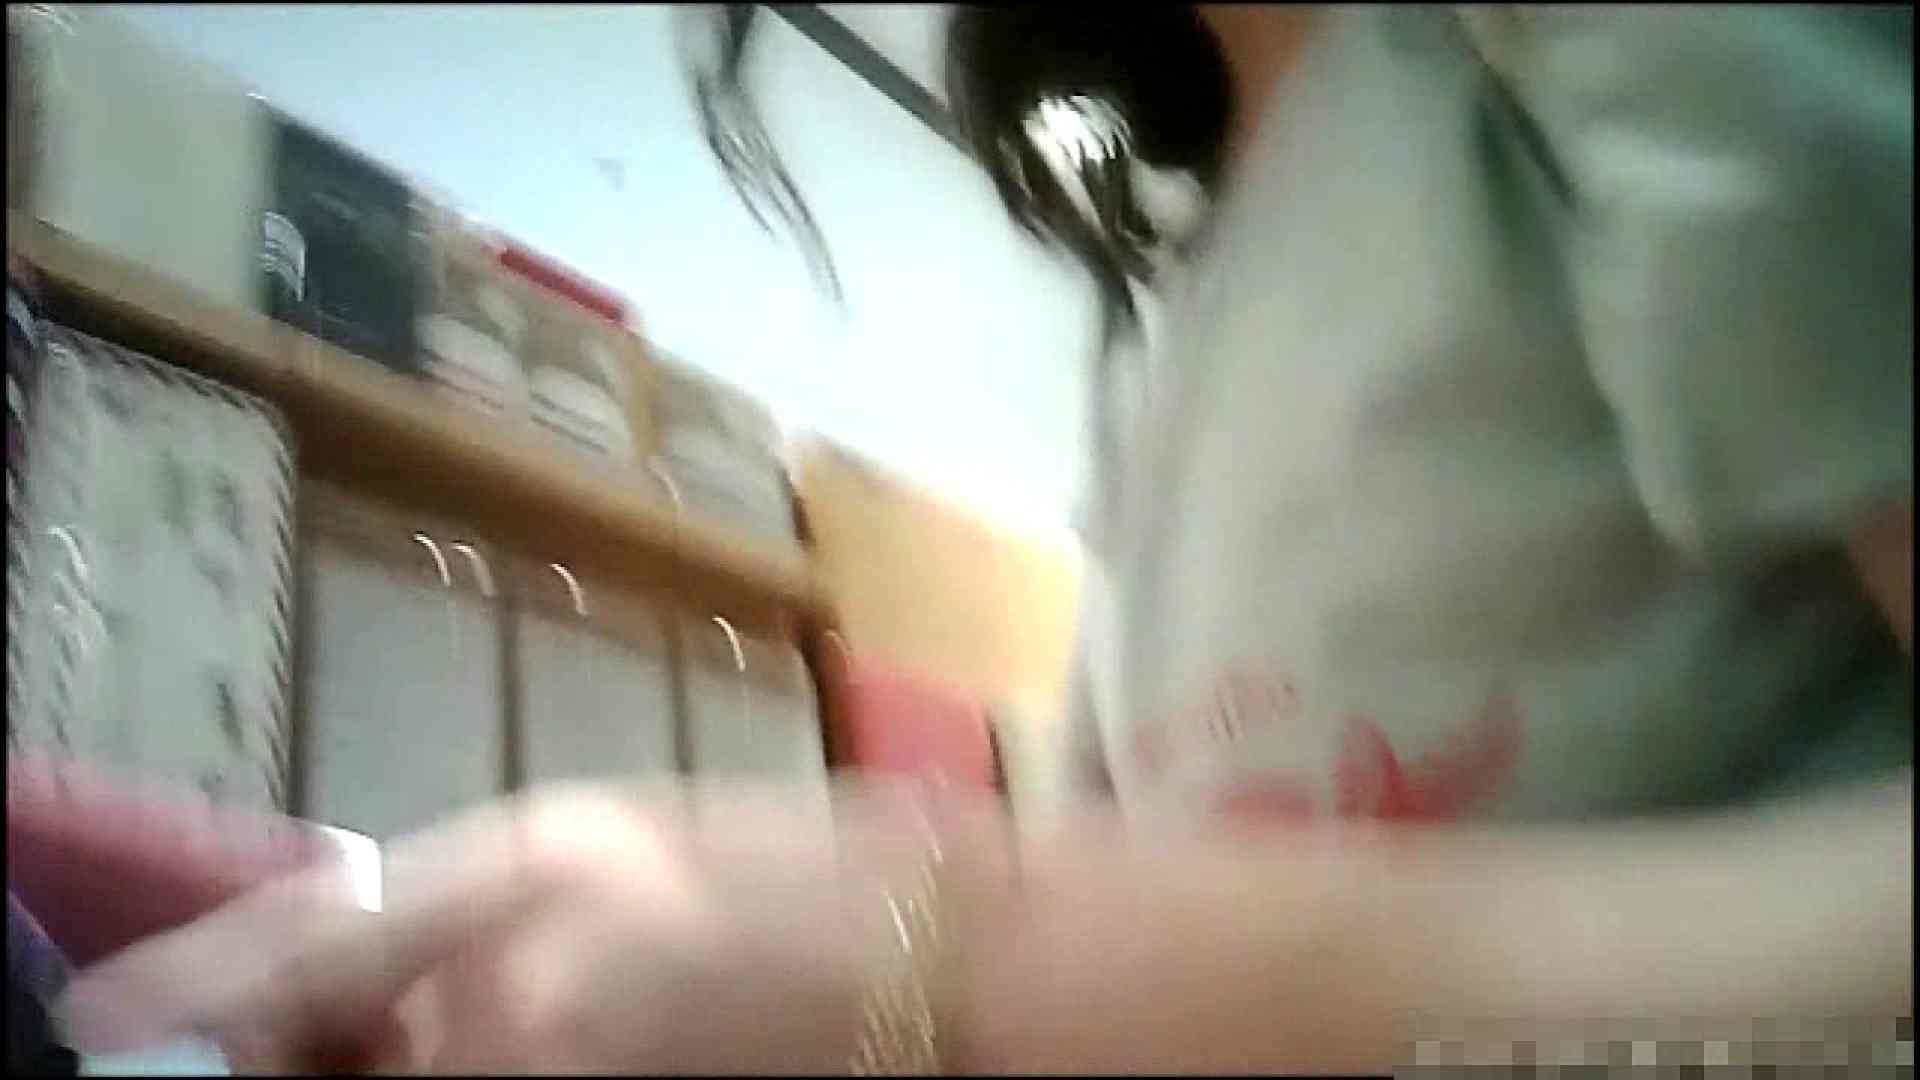 NO.3 友人間の情報で「処女」が確定している友達【某有名雑貨店】 チラ  69pic 38